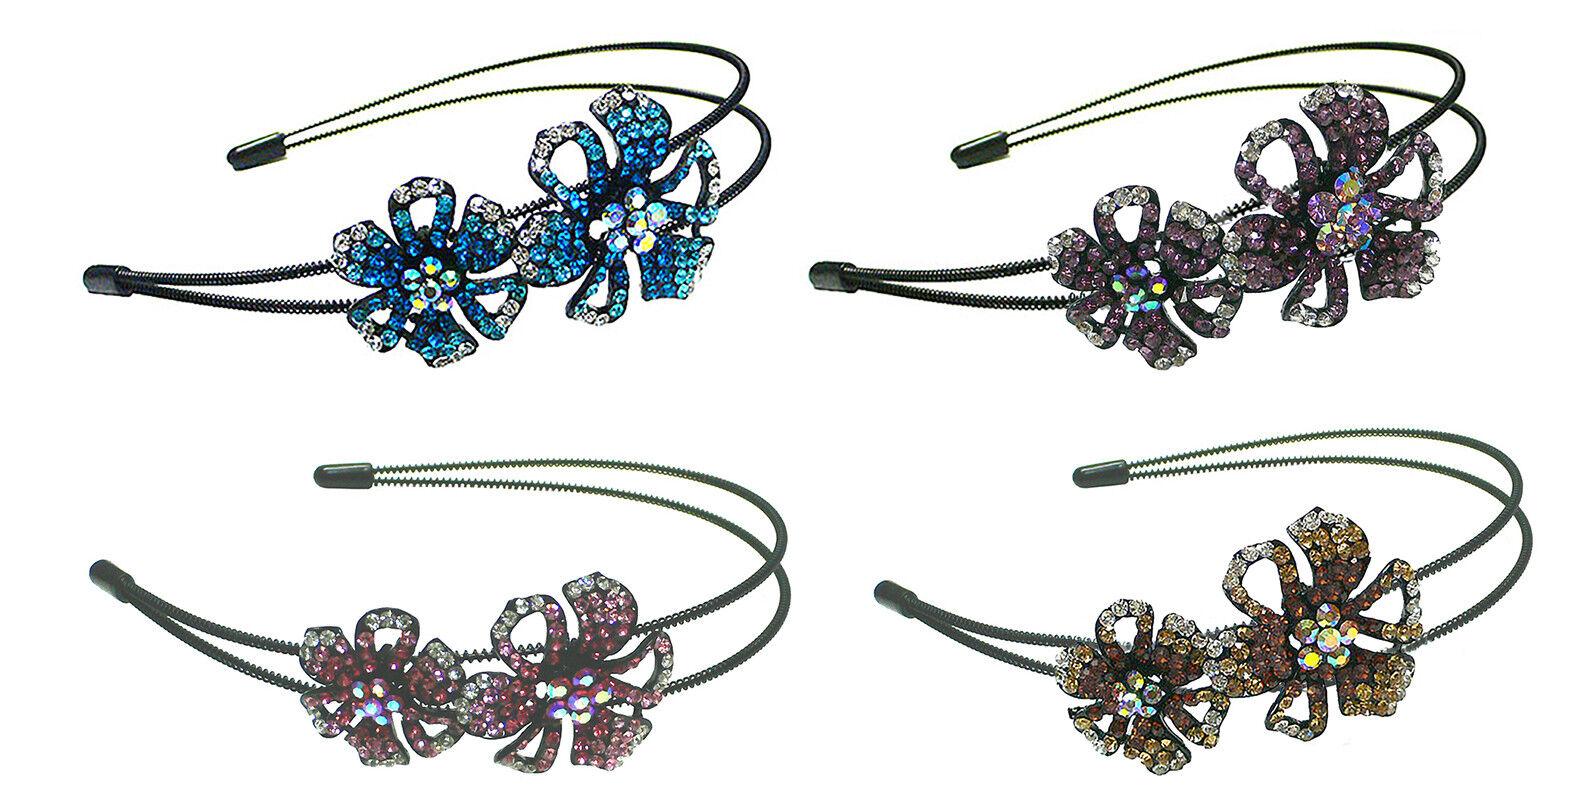 Bella Set of  4 Crystal Flower Headbands Metal Hair Bands Ad